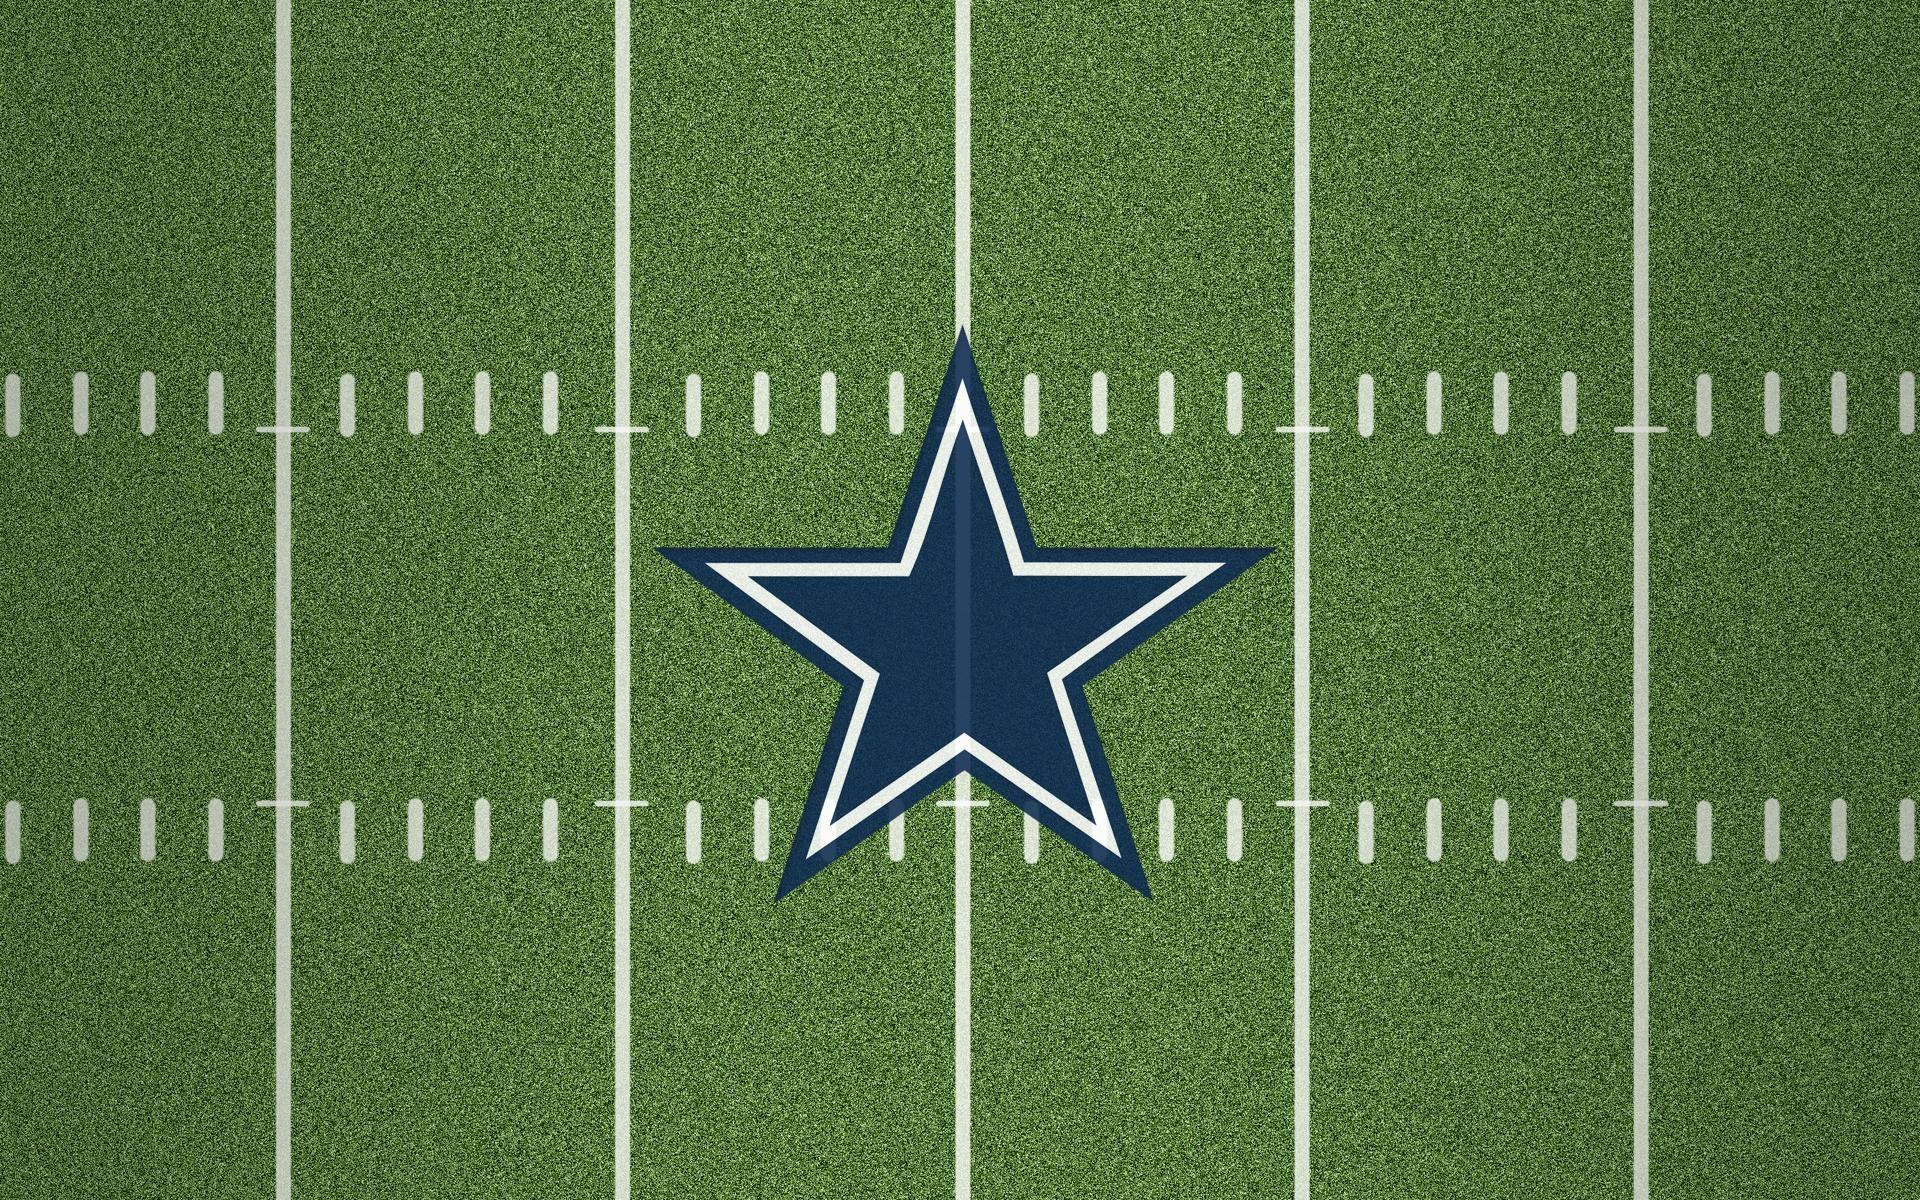 Dallas Cowboys Football Field Wallpaper HD